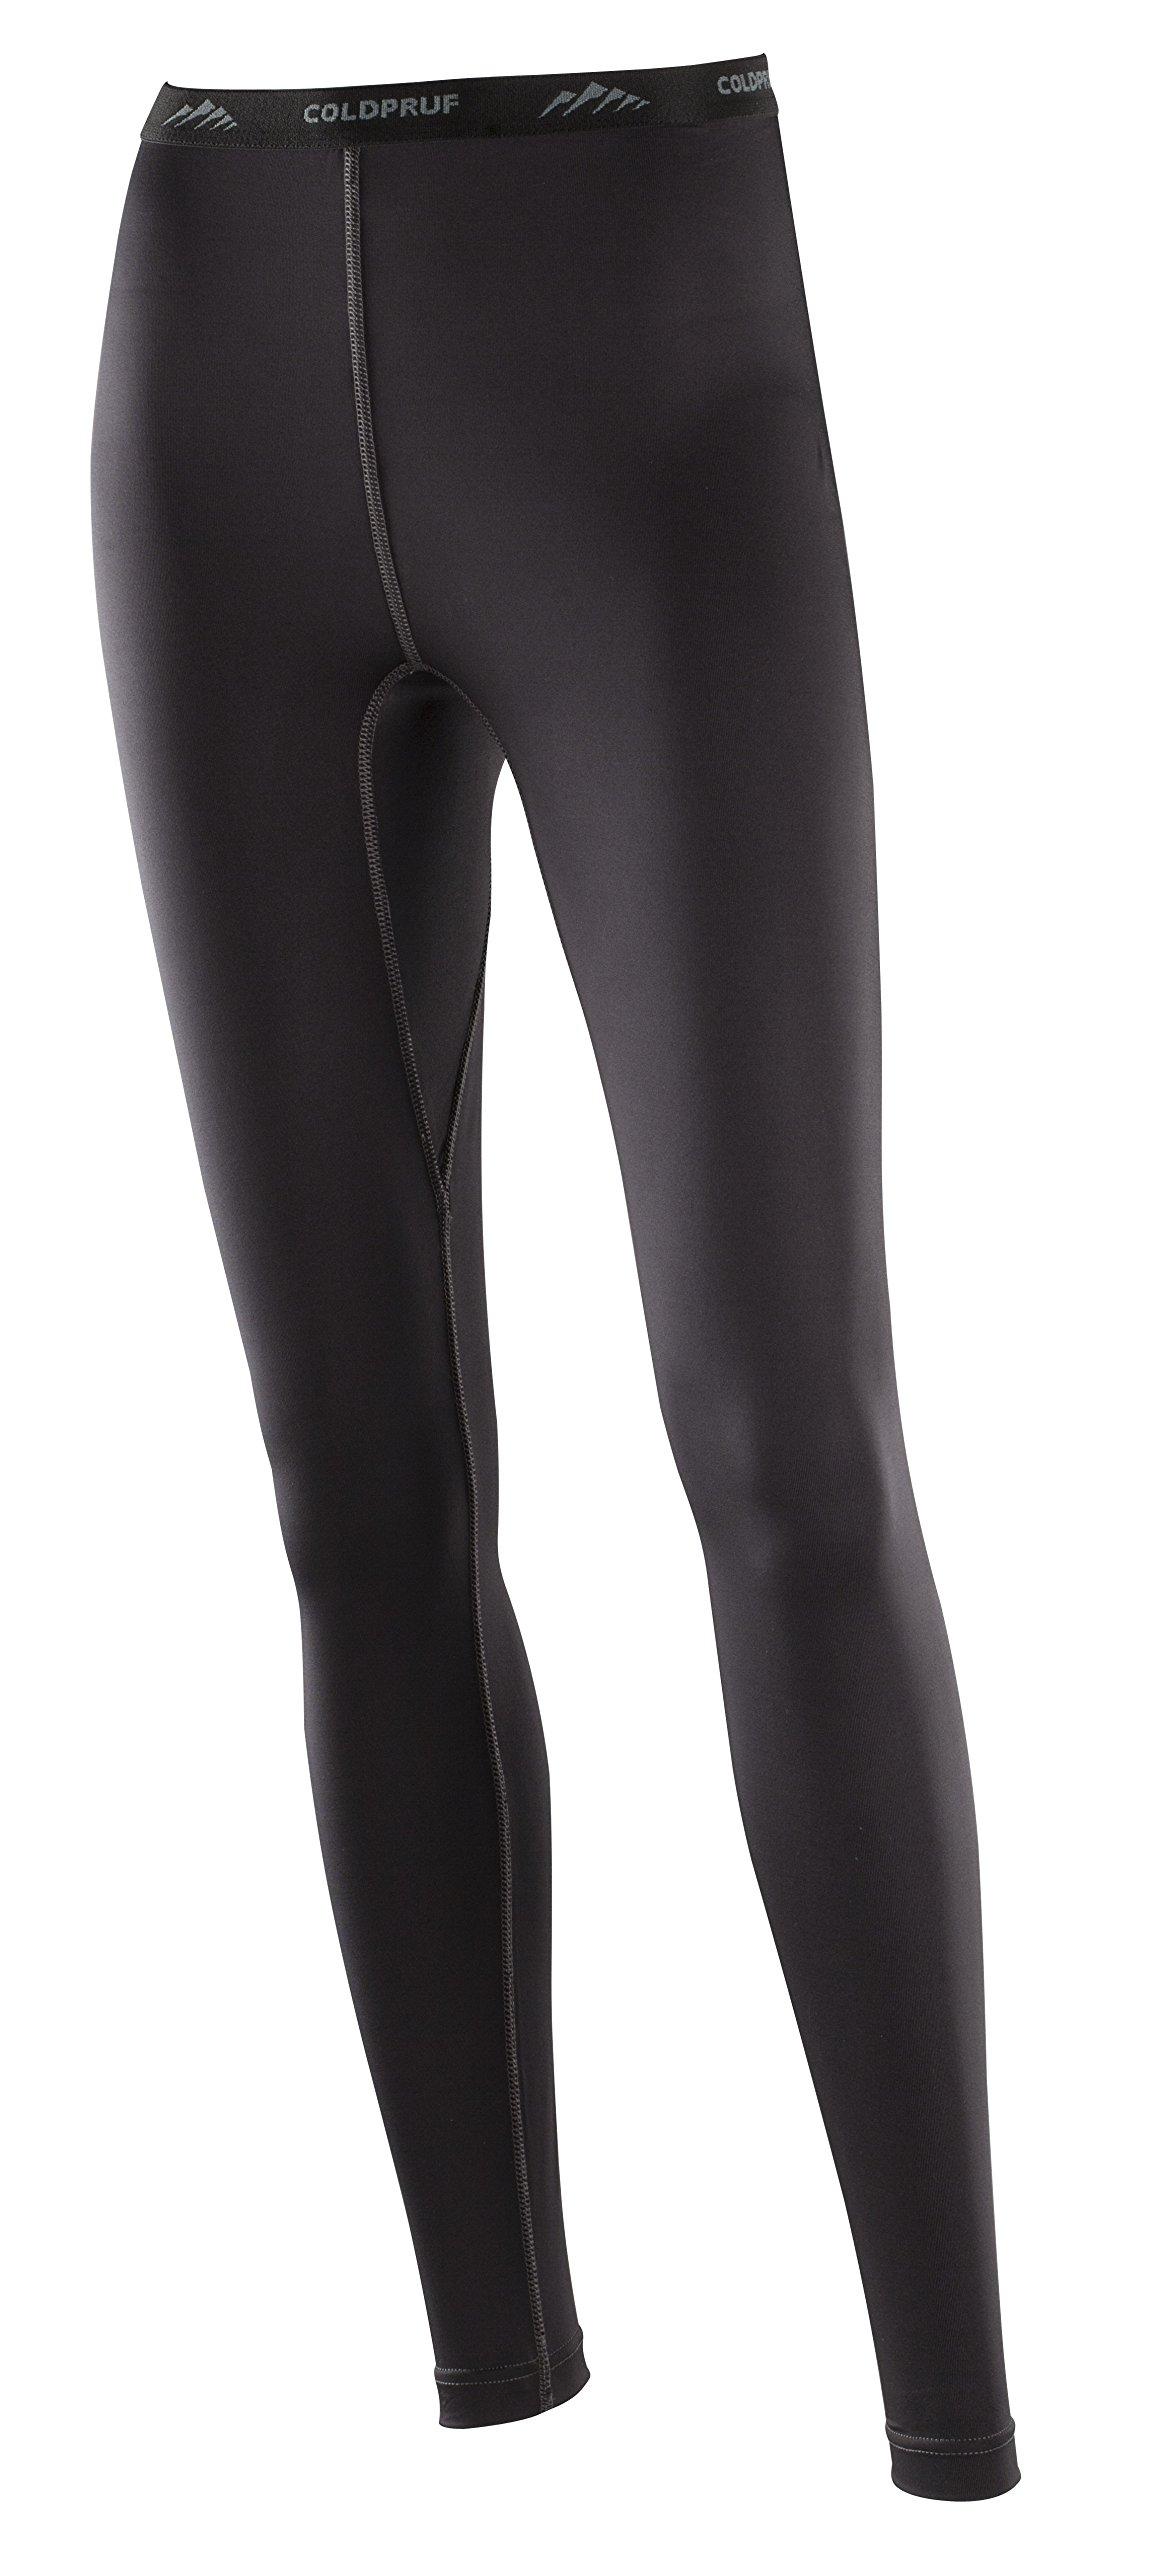 ColdPruf Women's Premium Performance Single Layer Bottom, Black, Small